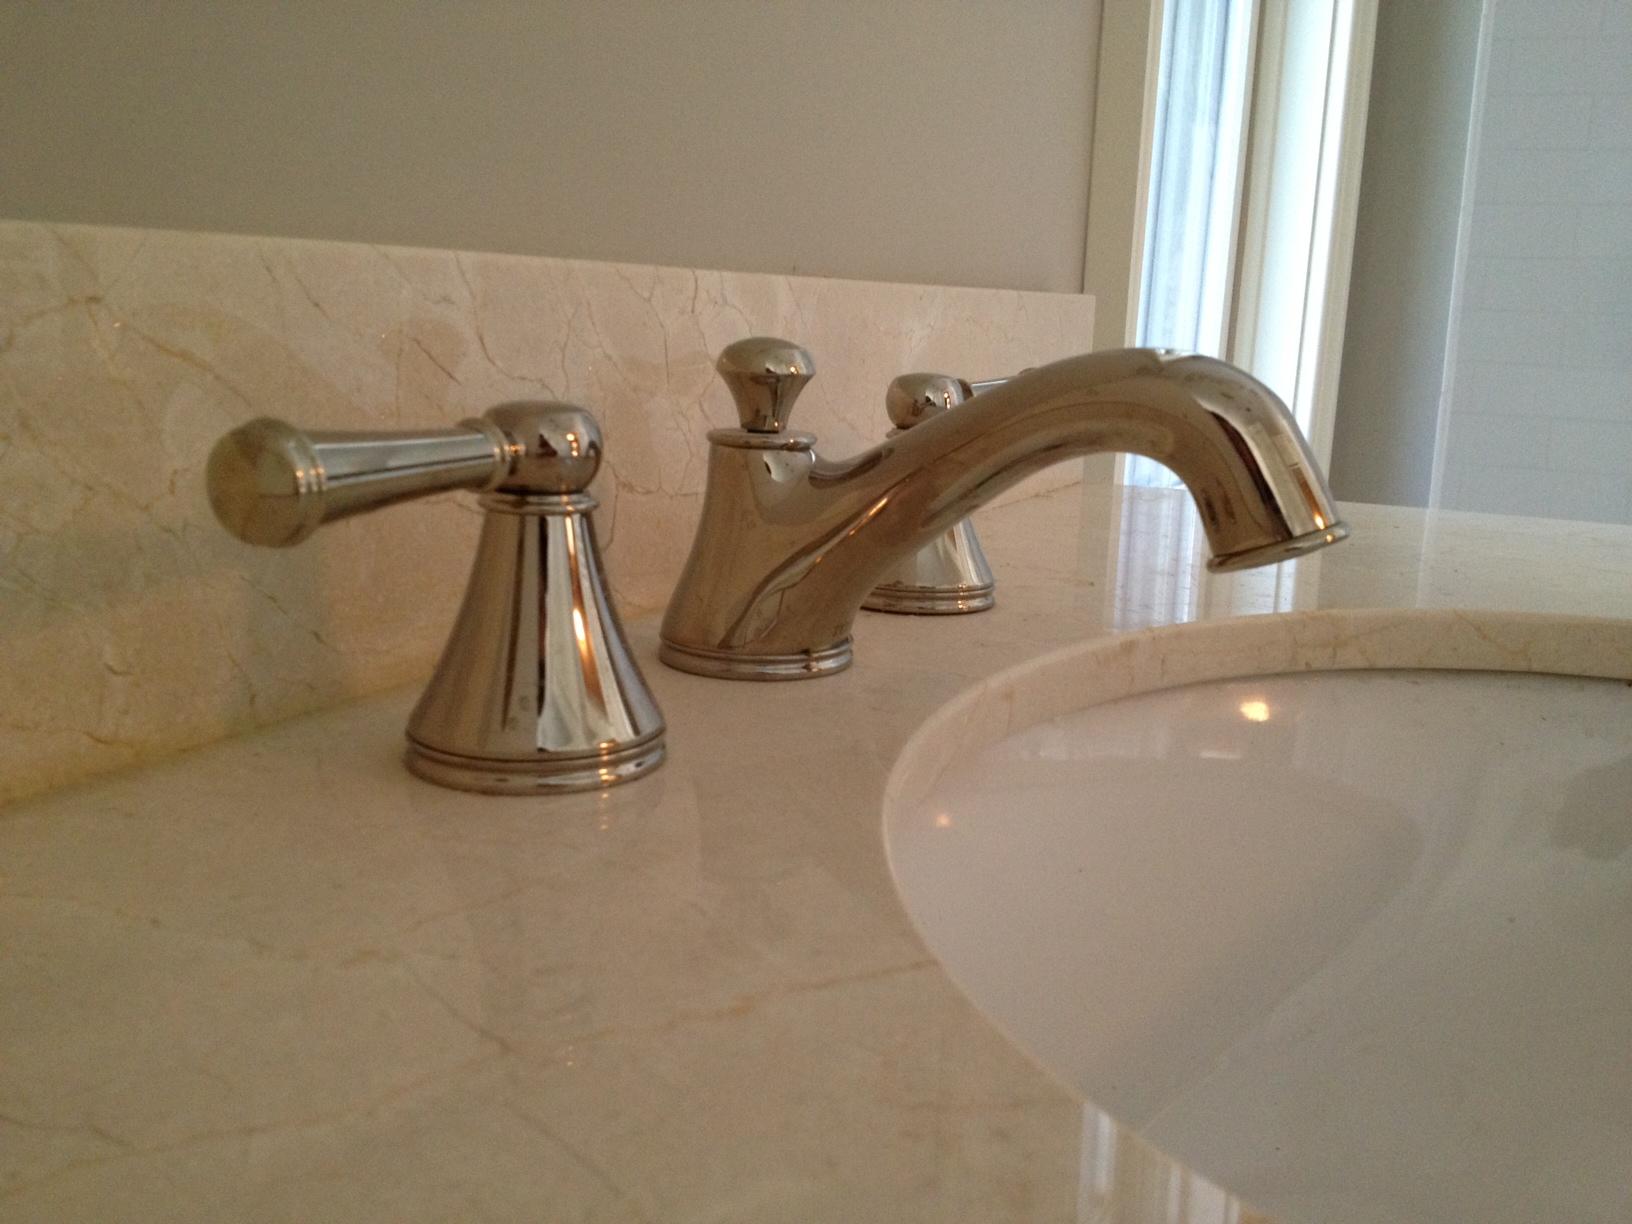 Polished Nickel Faucet, Crema Marfil Countertop, Benjamin Moore Revere  Pewter Paint